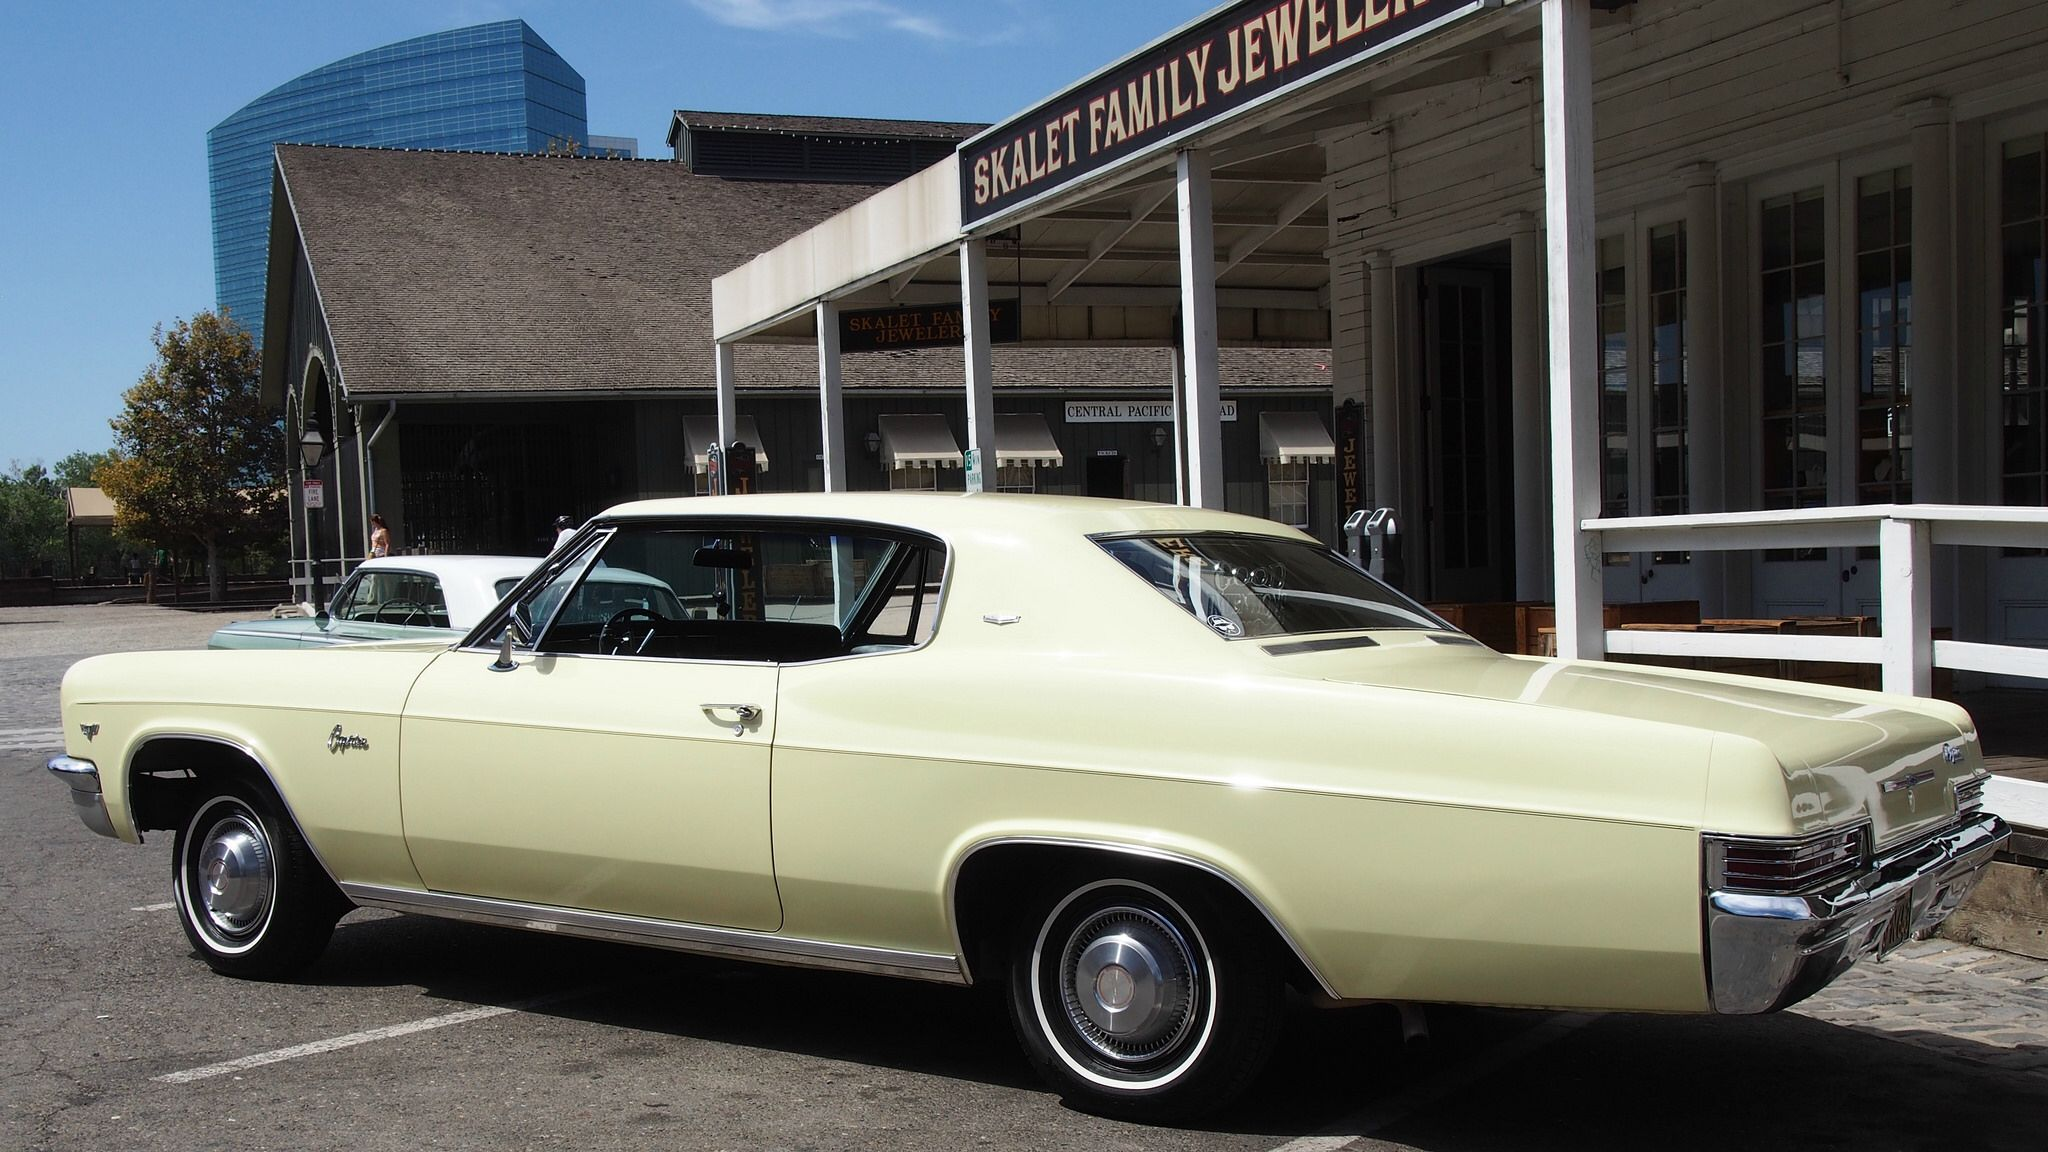 1966 Chevrolet Caprice Hardtiop 'SPN 643' 4 The Grand